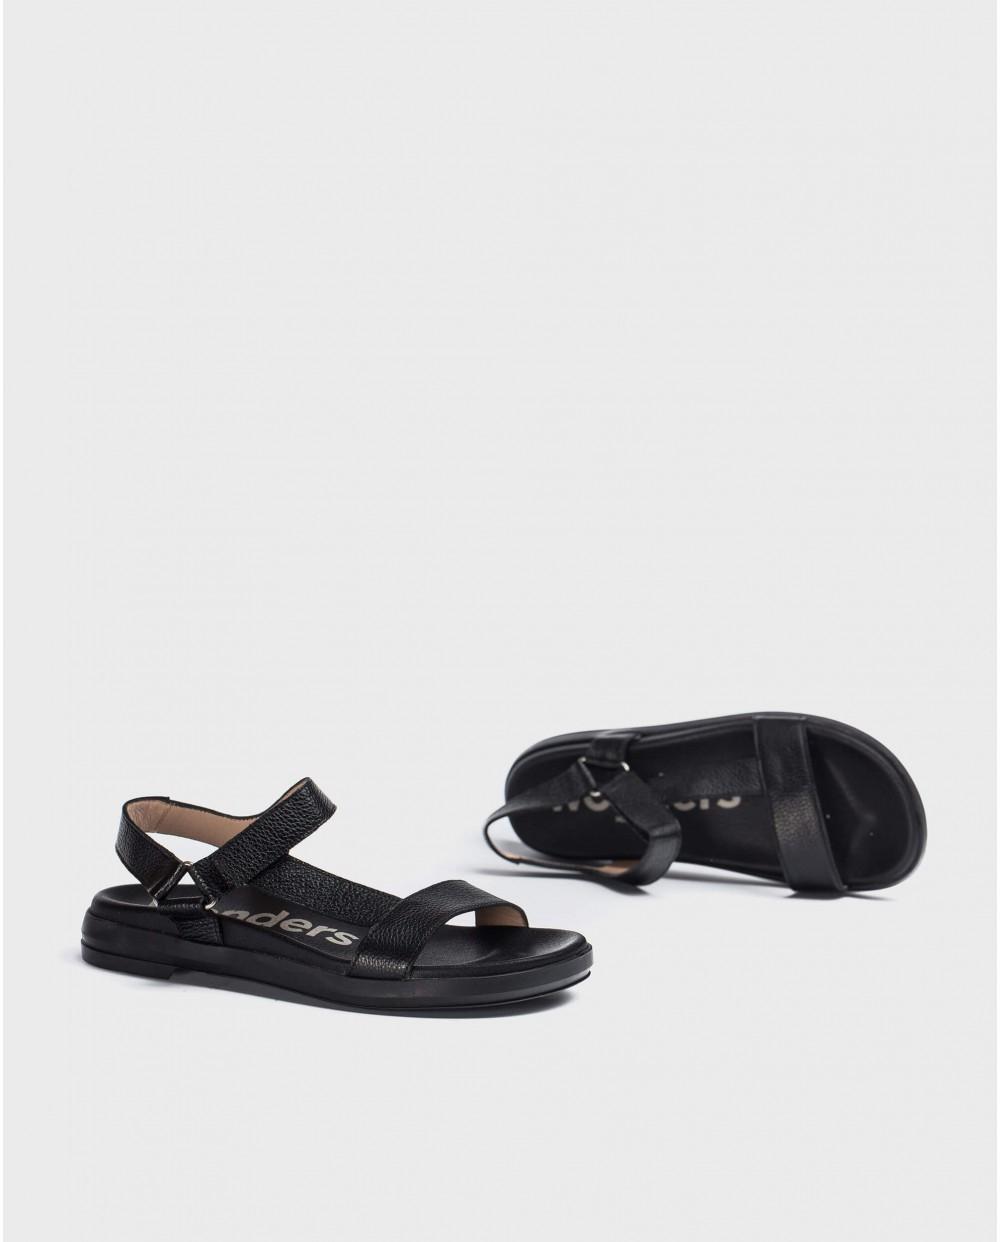 Wonders-Flat Shoes-BIO adjustable sandal